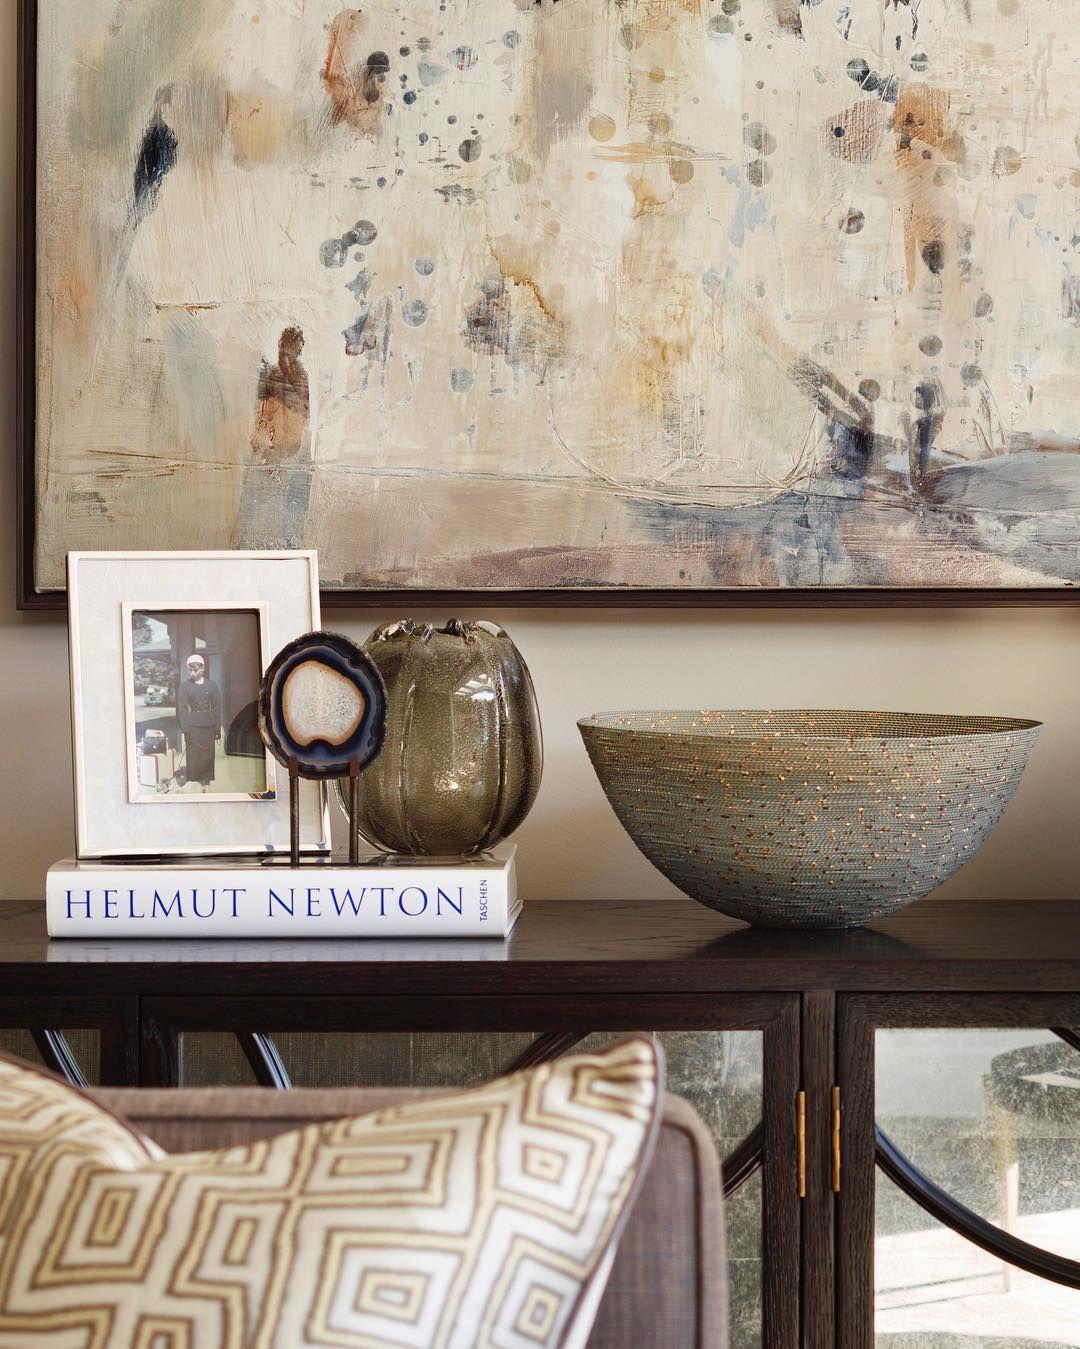 Textures Art Styling Love This Vignette Sophie Paterson Interiors Neutral Interior Design Vignettes